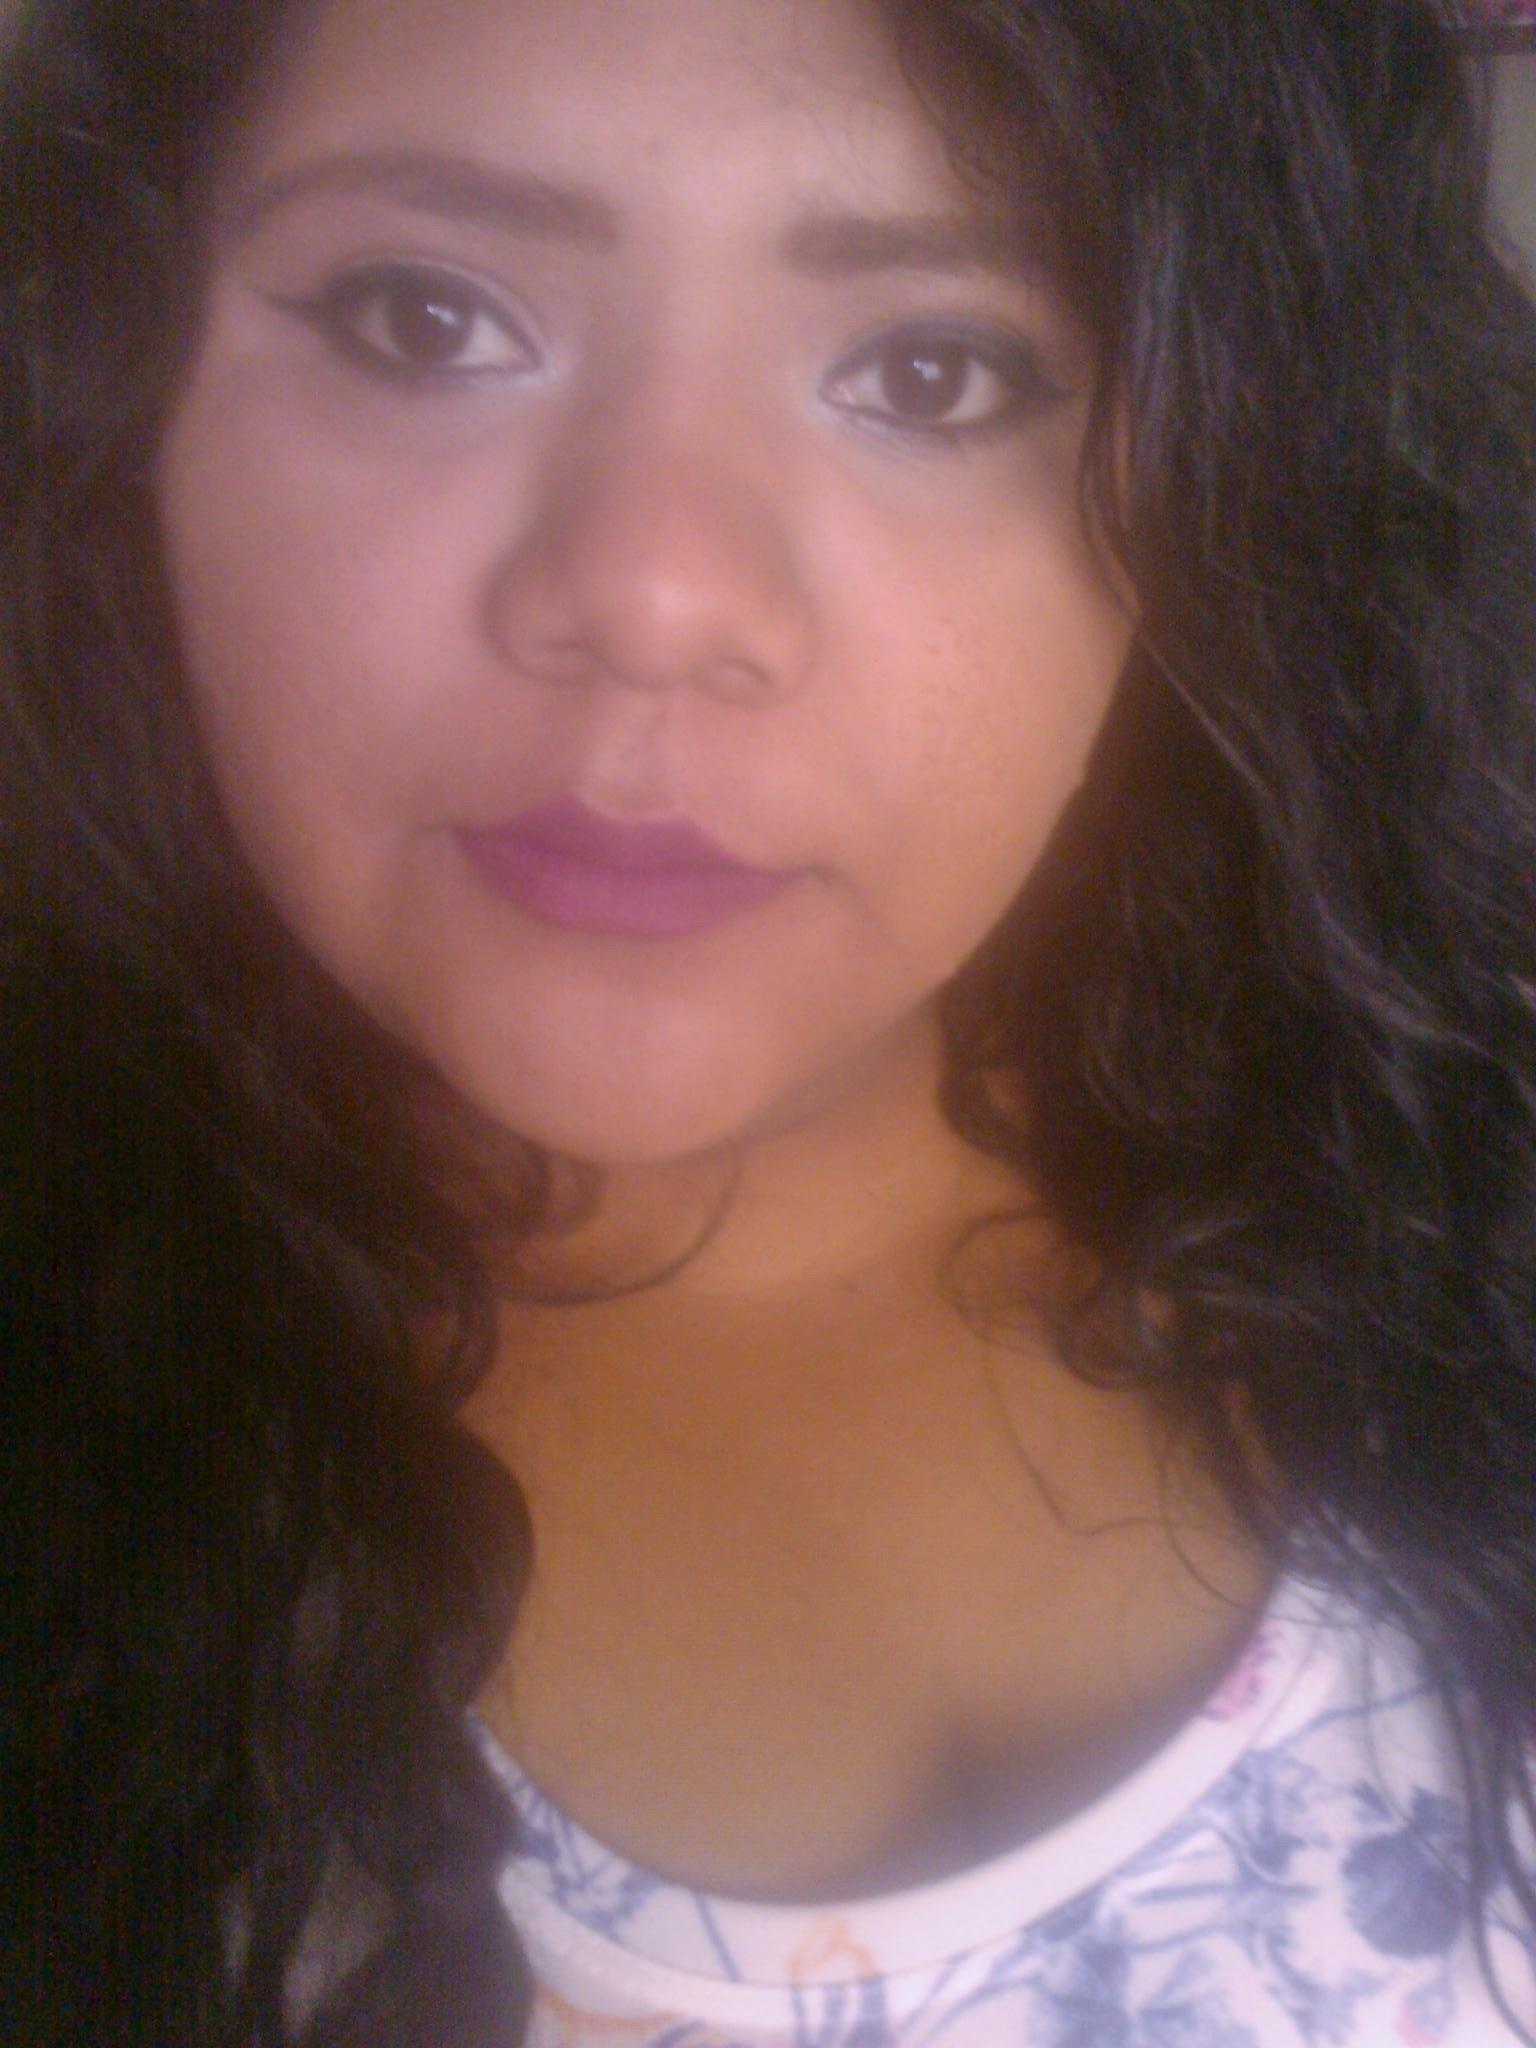 Marie Mosquini,Mali Harries Sex pics & movies Patricia Roc,Leomie Anderson GBR 4 2015?resent